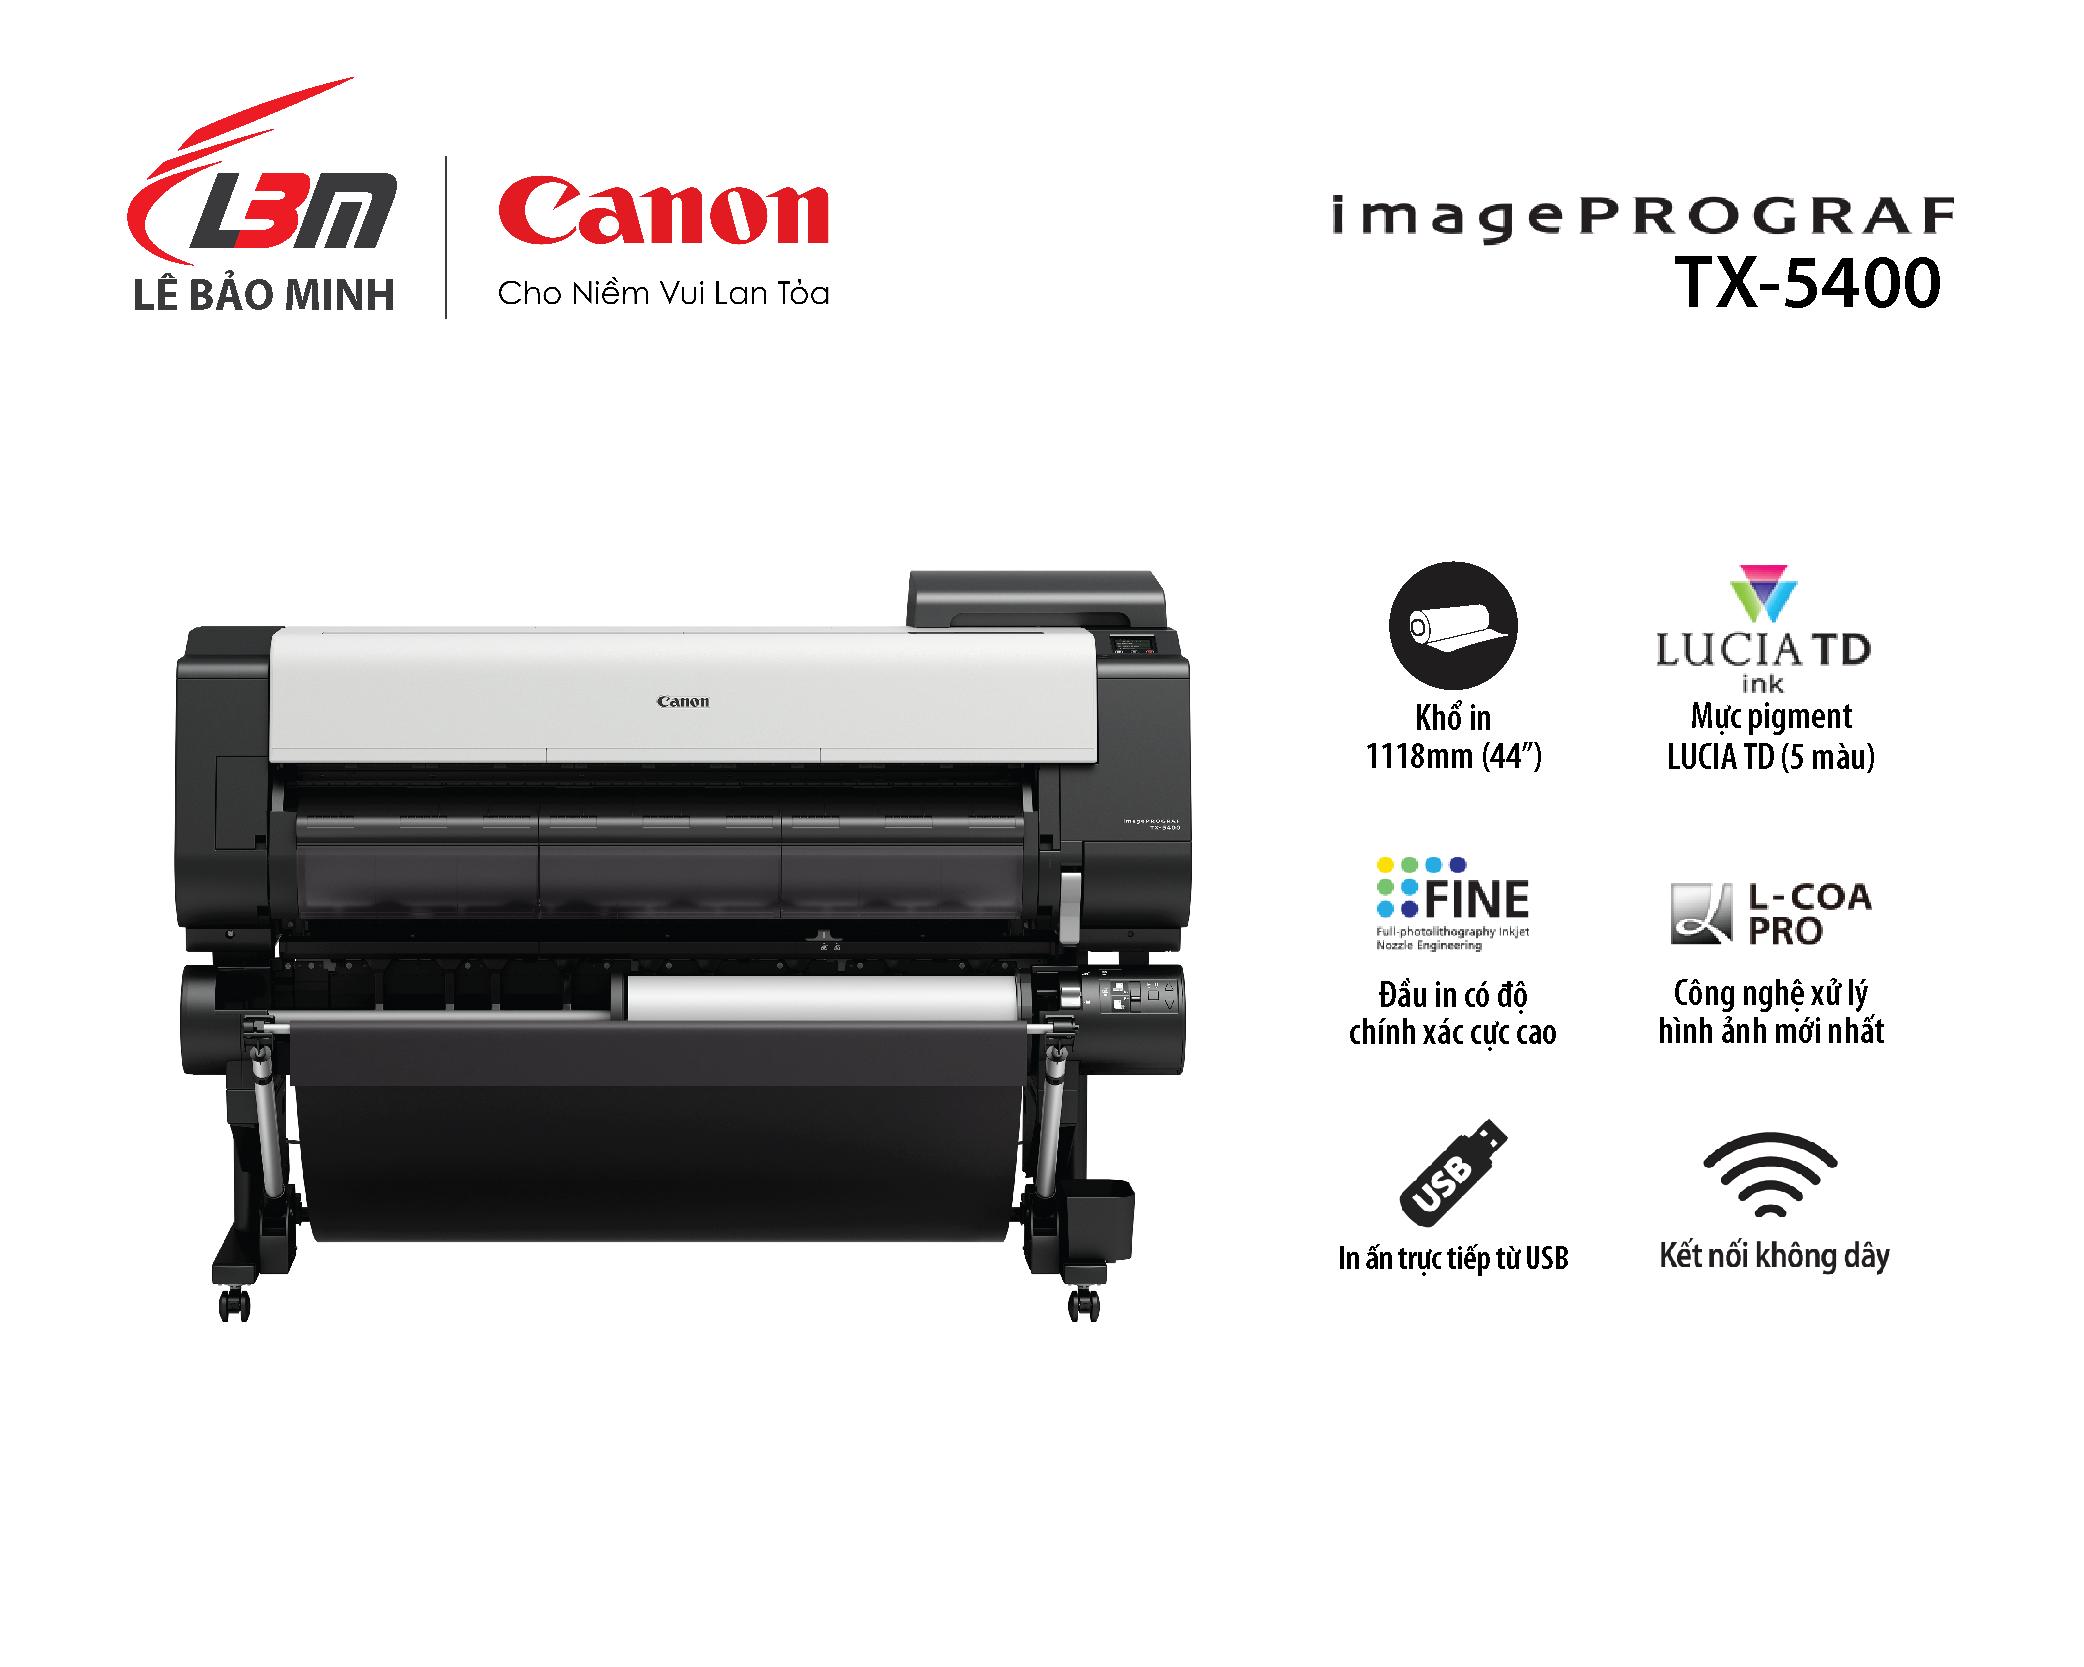 imagePROGRAF TX-5400 MFP T36